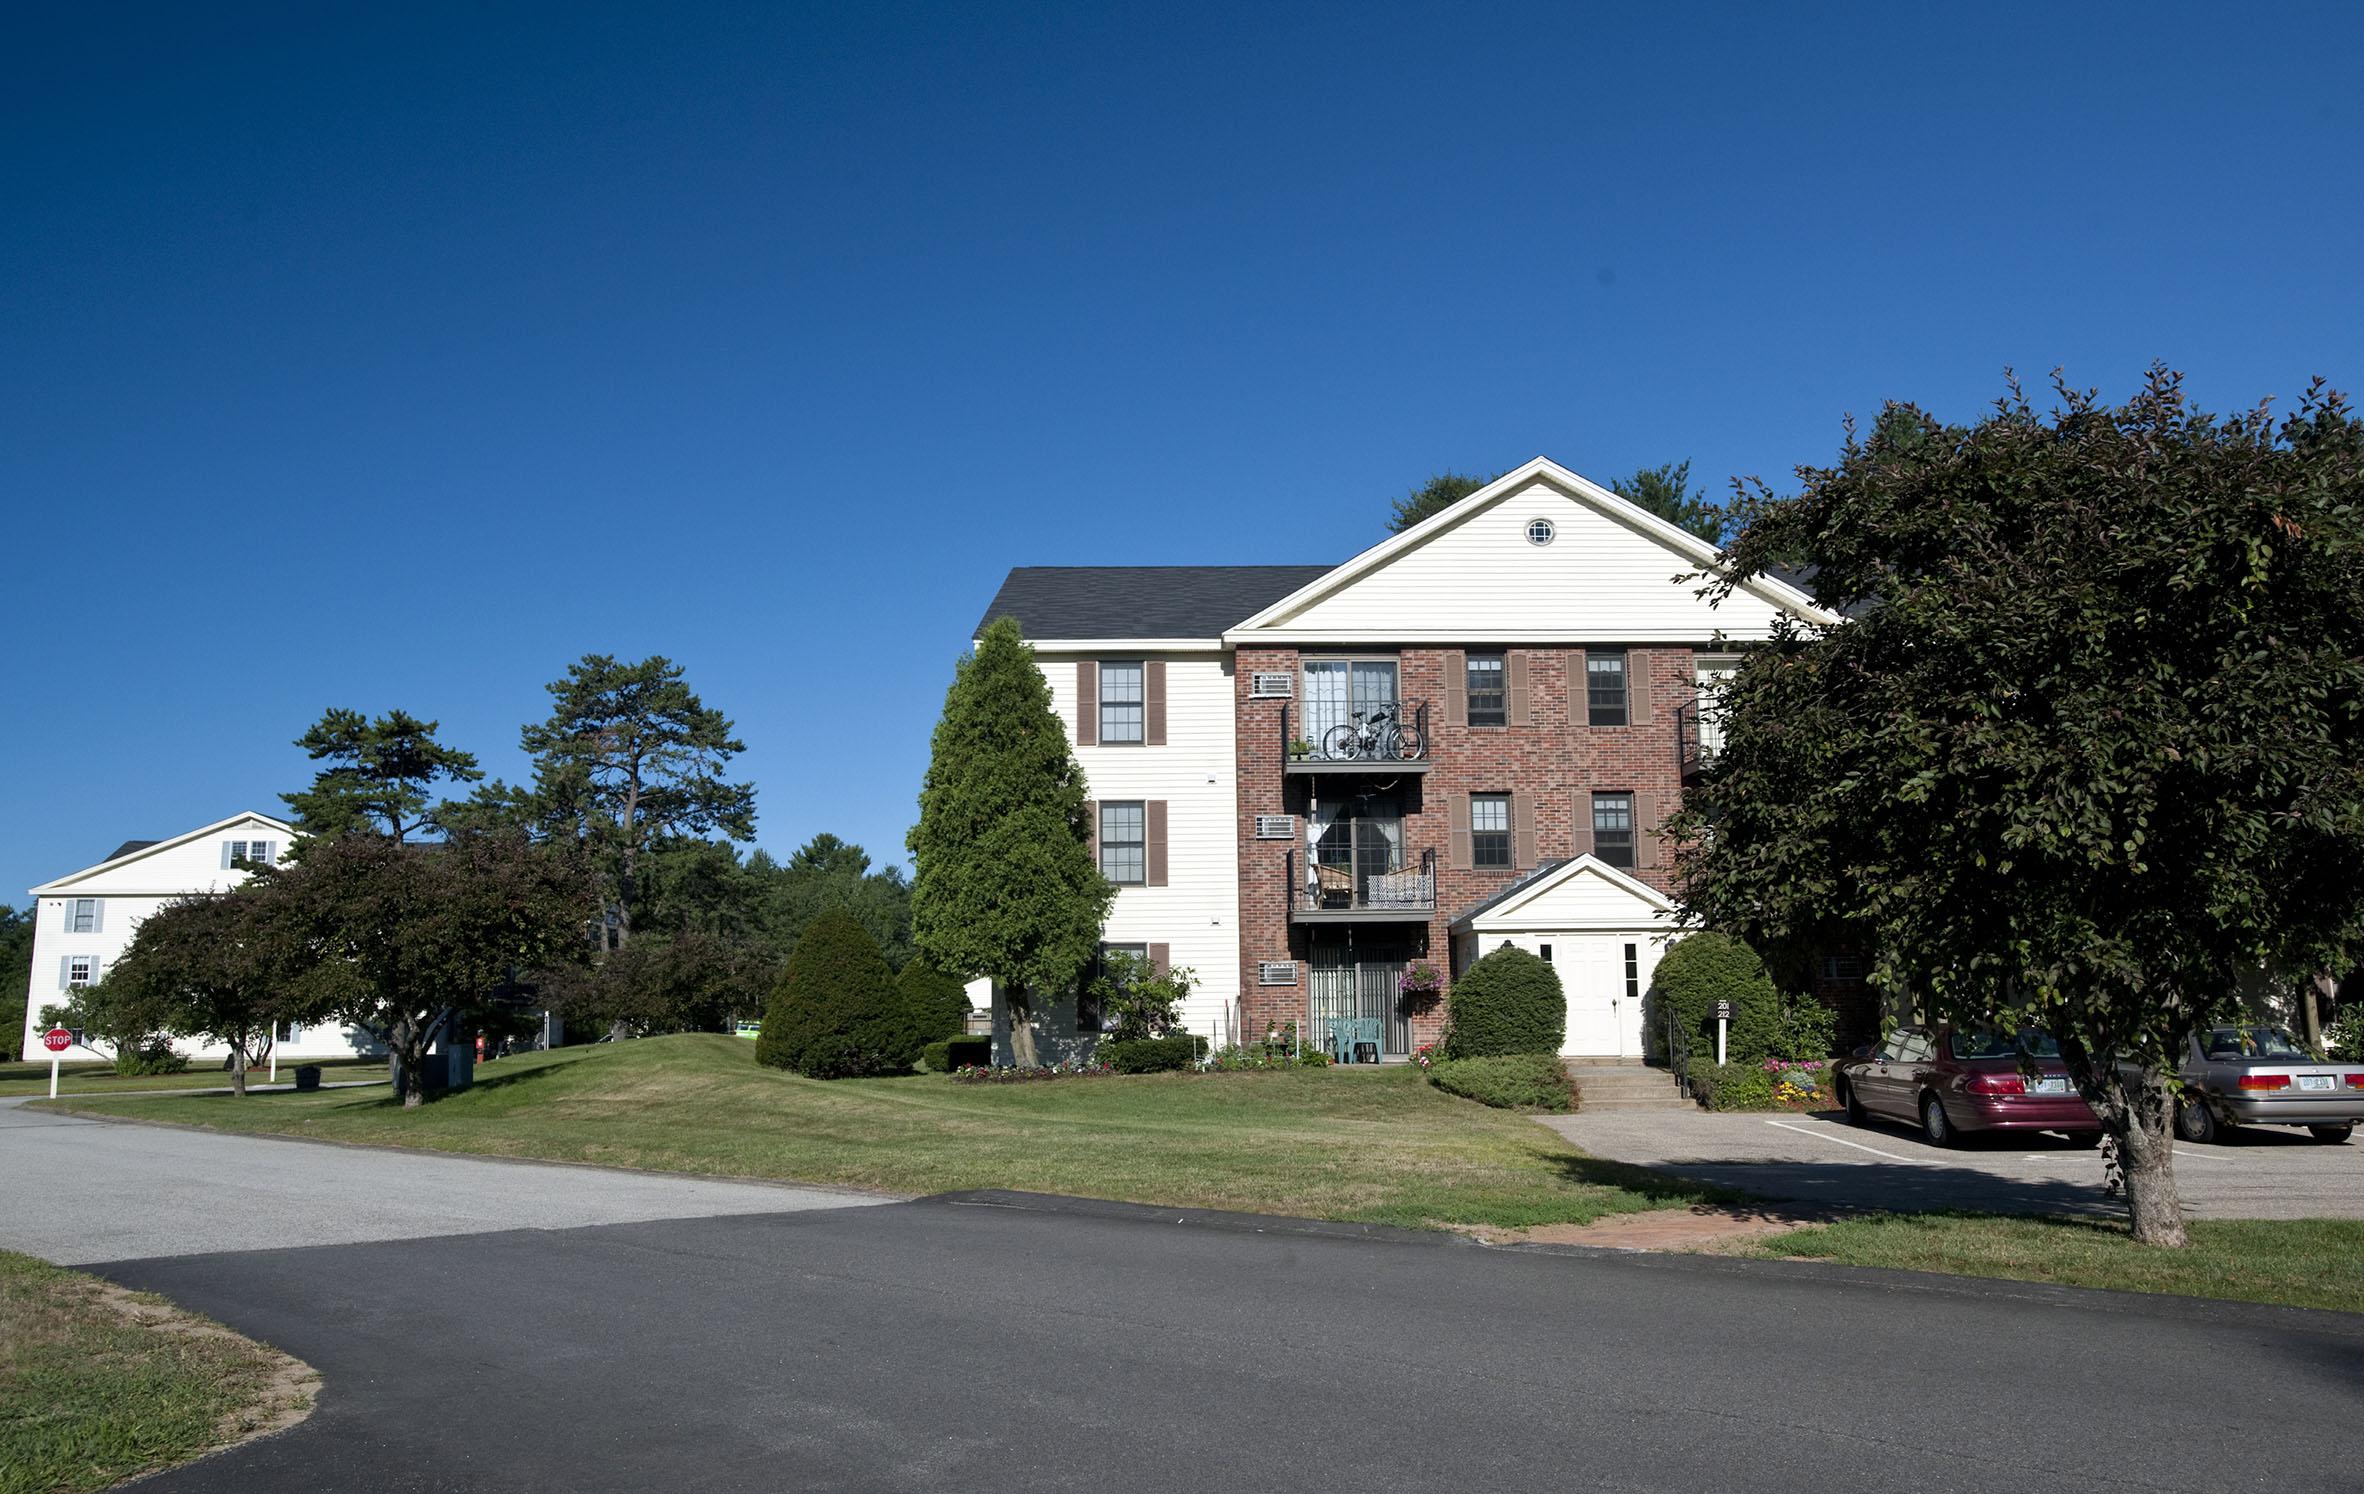 Alton Woods, Concord NH